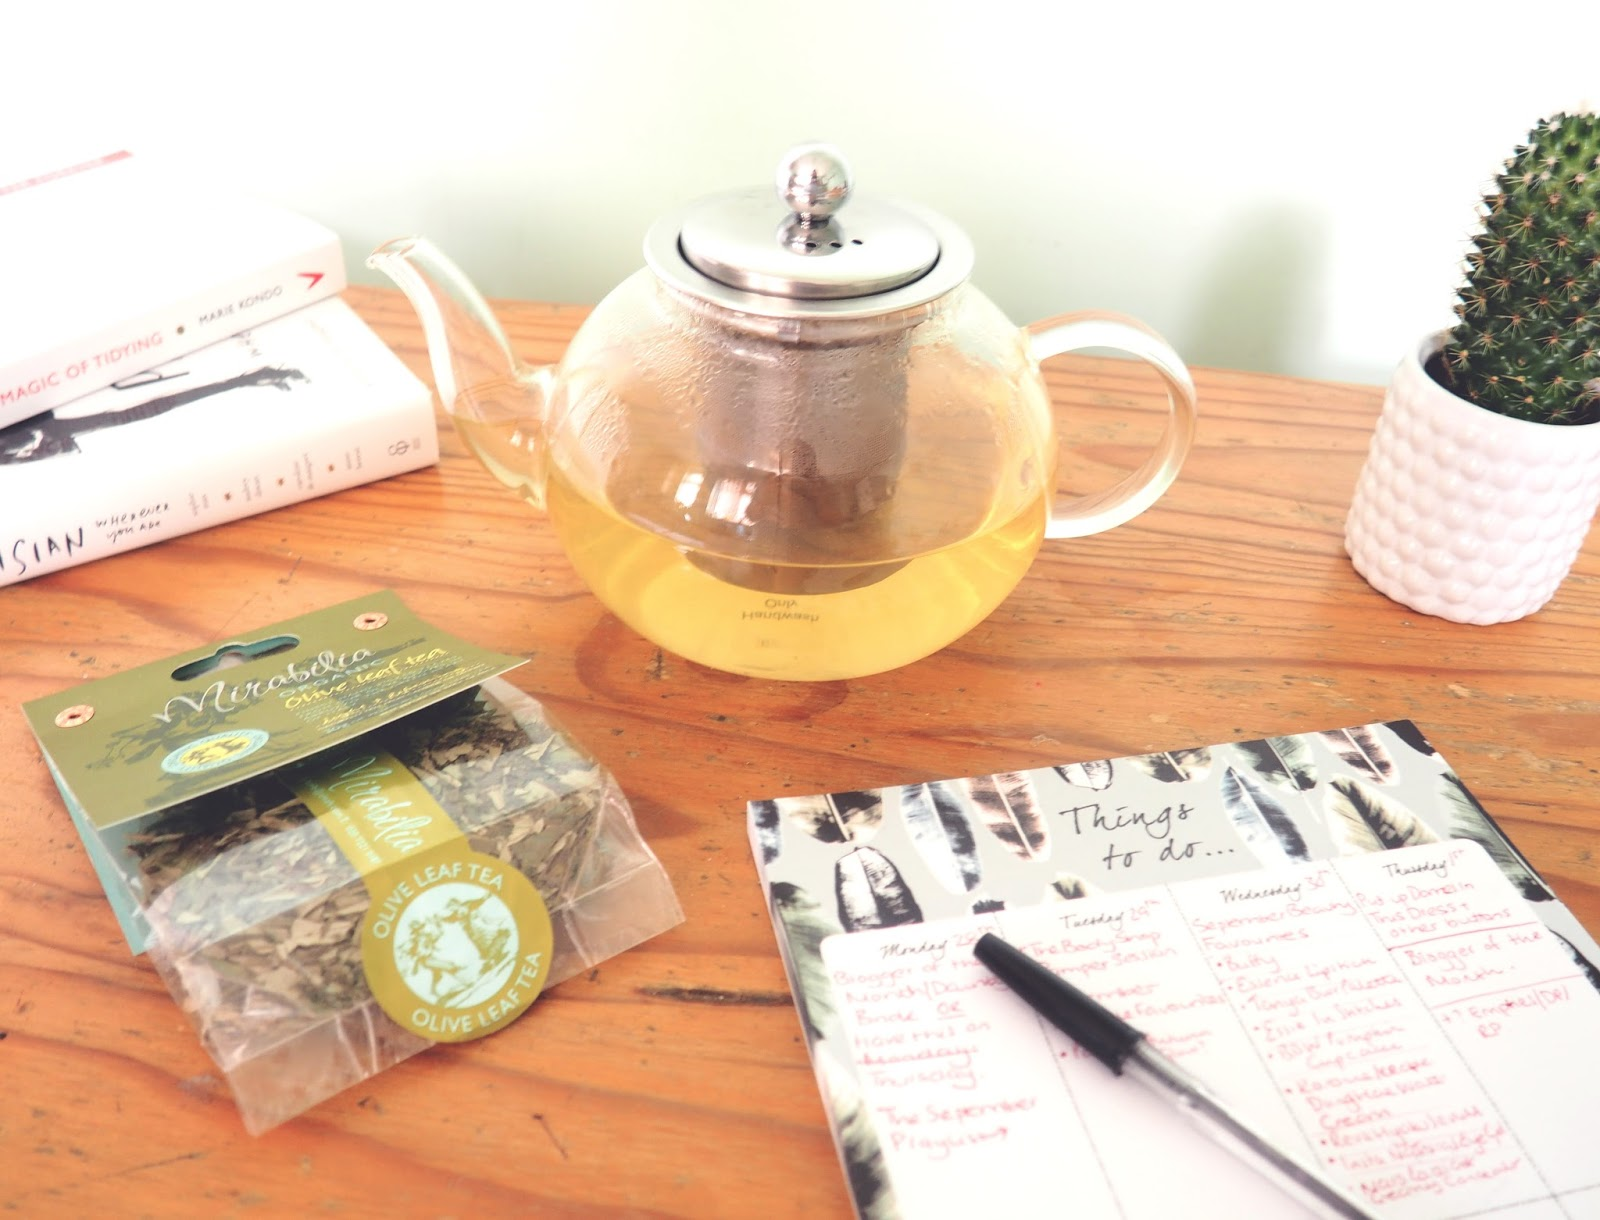 Mirabilia Olive Leaf Tea Review